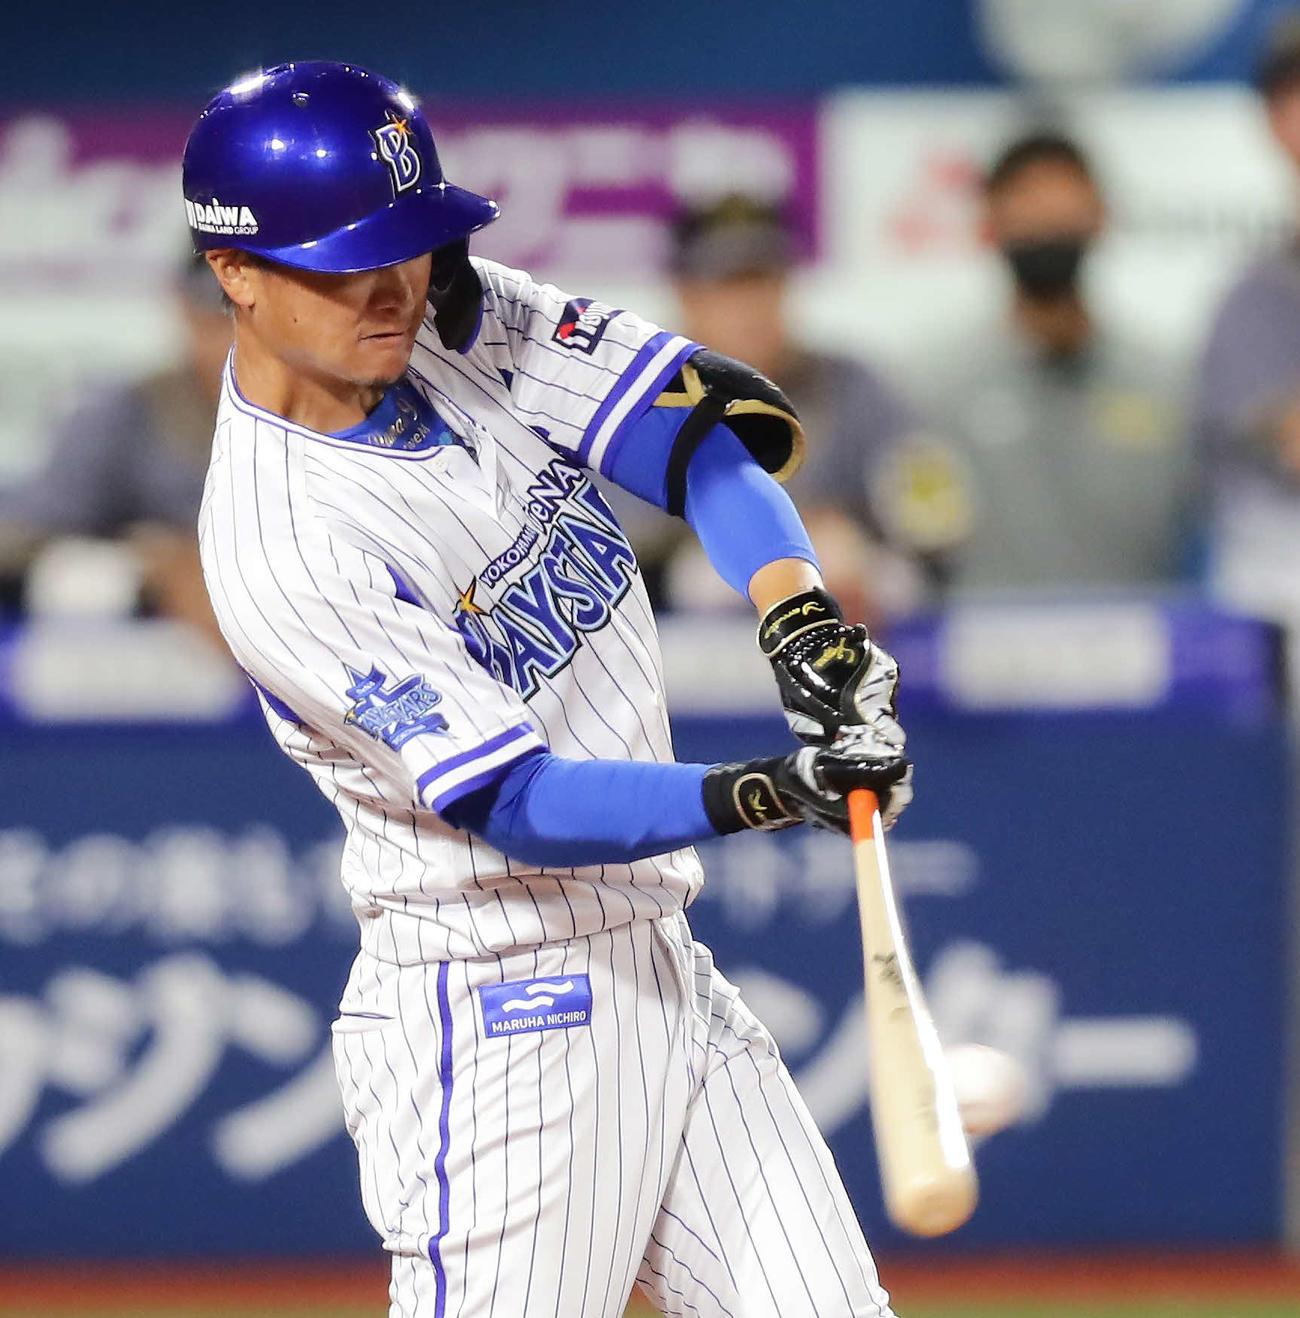 DeNA対阪神 7回裏DeNA2死一、三塁、大和は左翼線に2点適時二塁打を放つ(撮影・丹羽敏通)